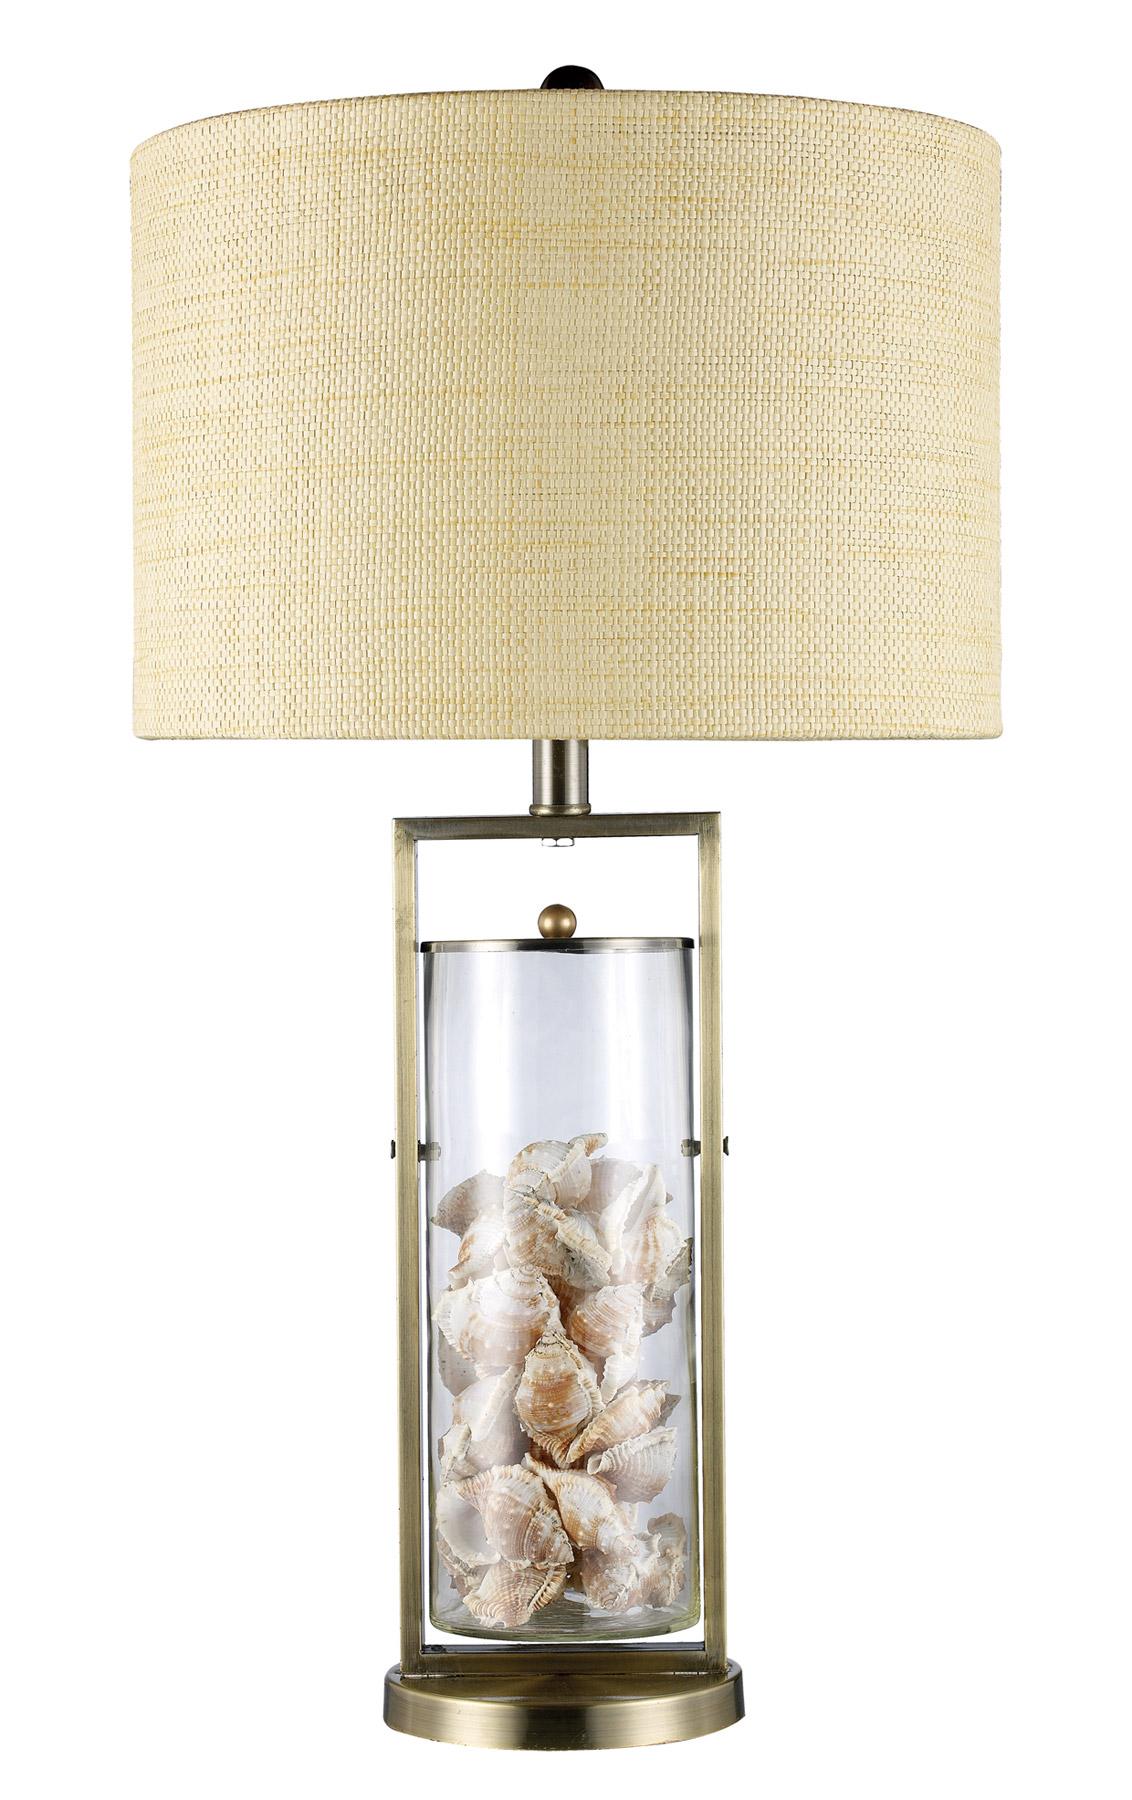 Great Dimond D1978 Millisle Seashells Table Lamp